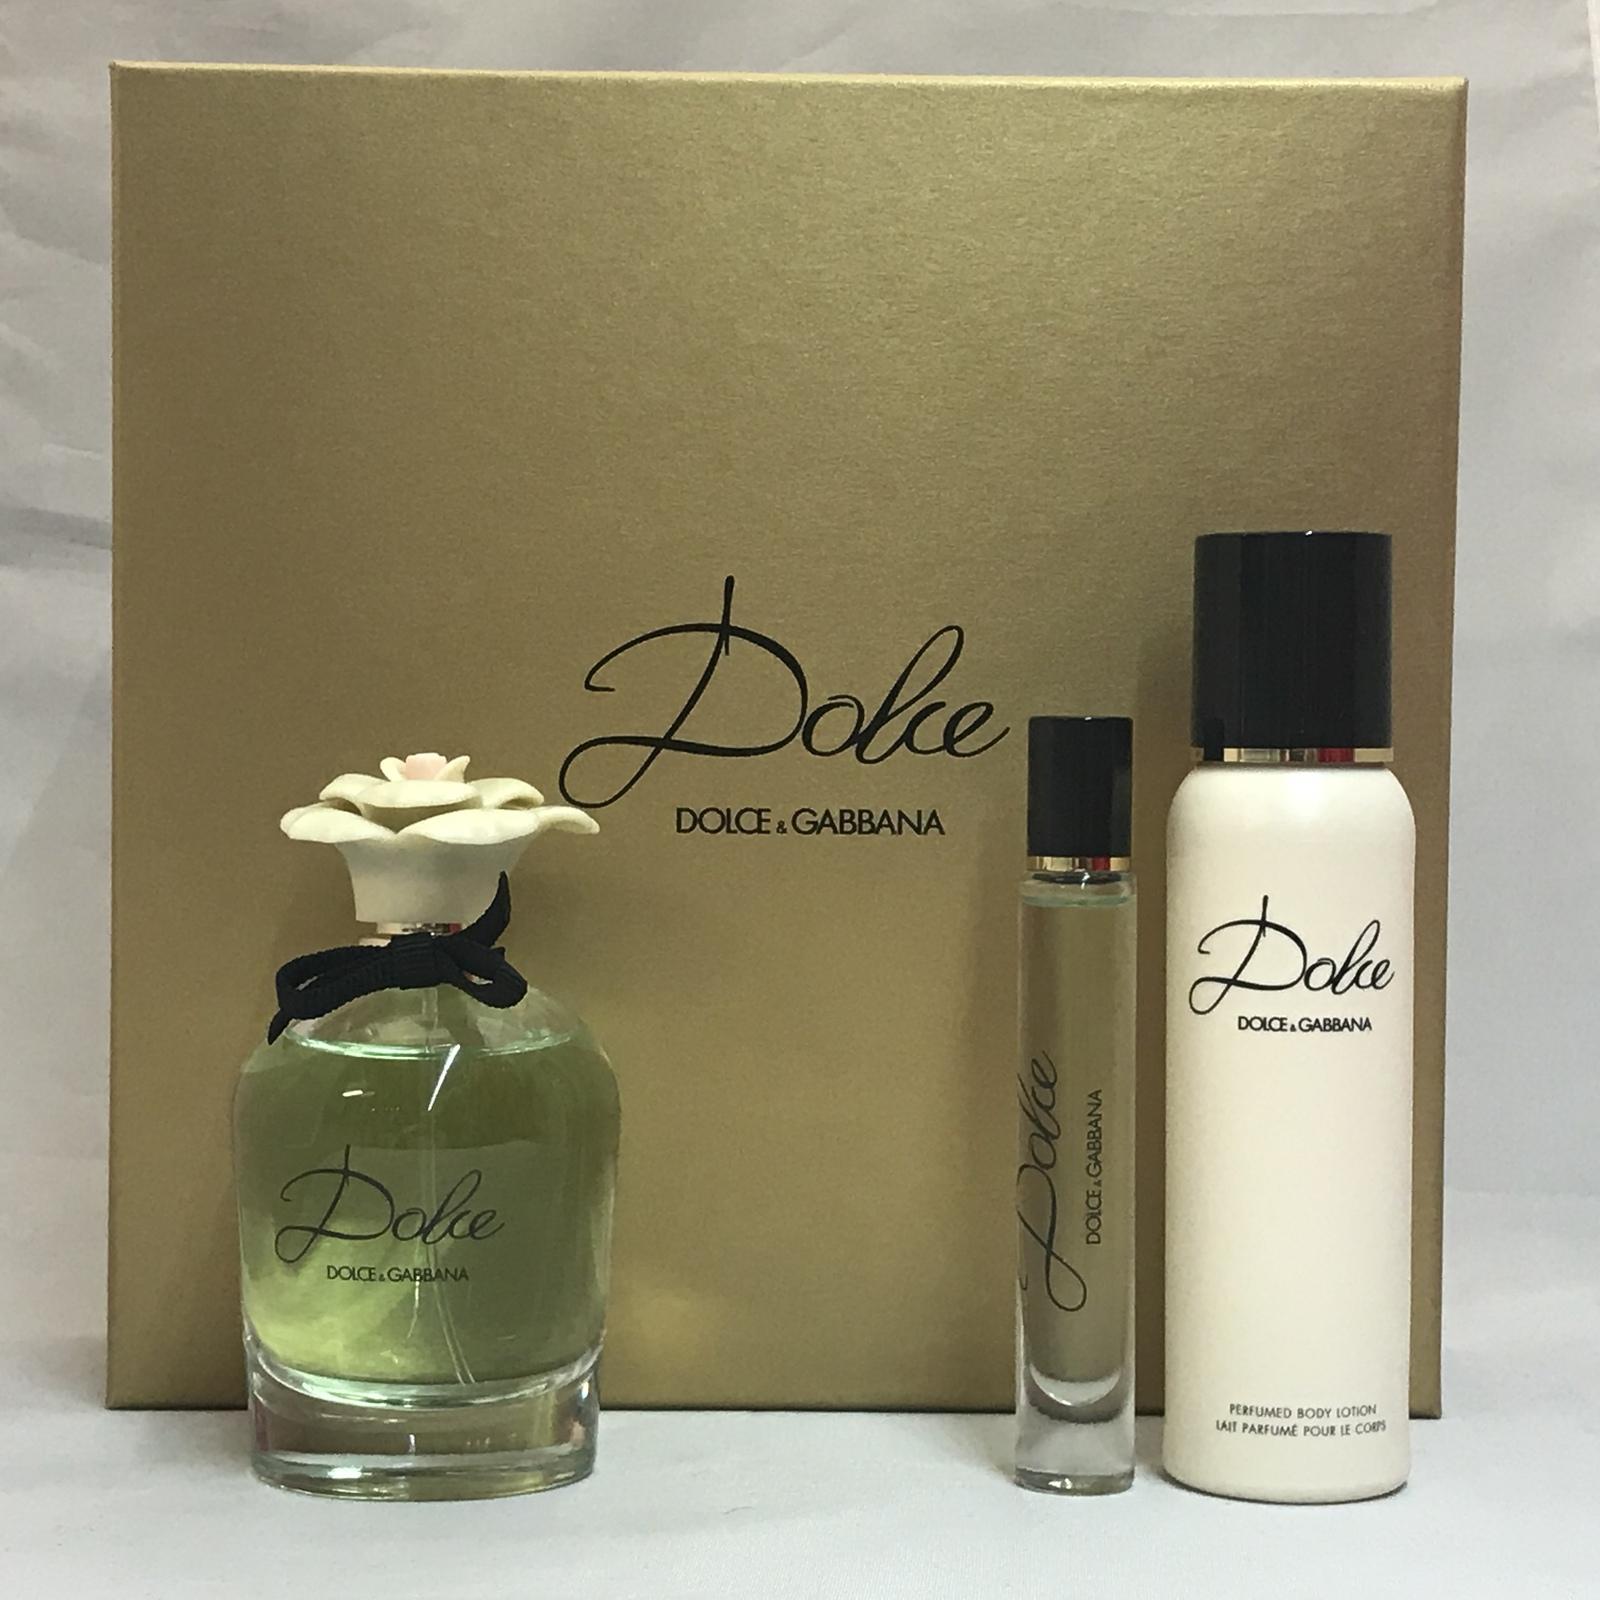 Dolce by Dolce & Gabbana 3PCs Women Set, 2.5 + 0.25 + 3.3oz perfumed body lotion image 3